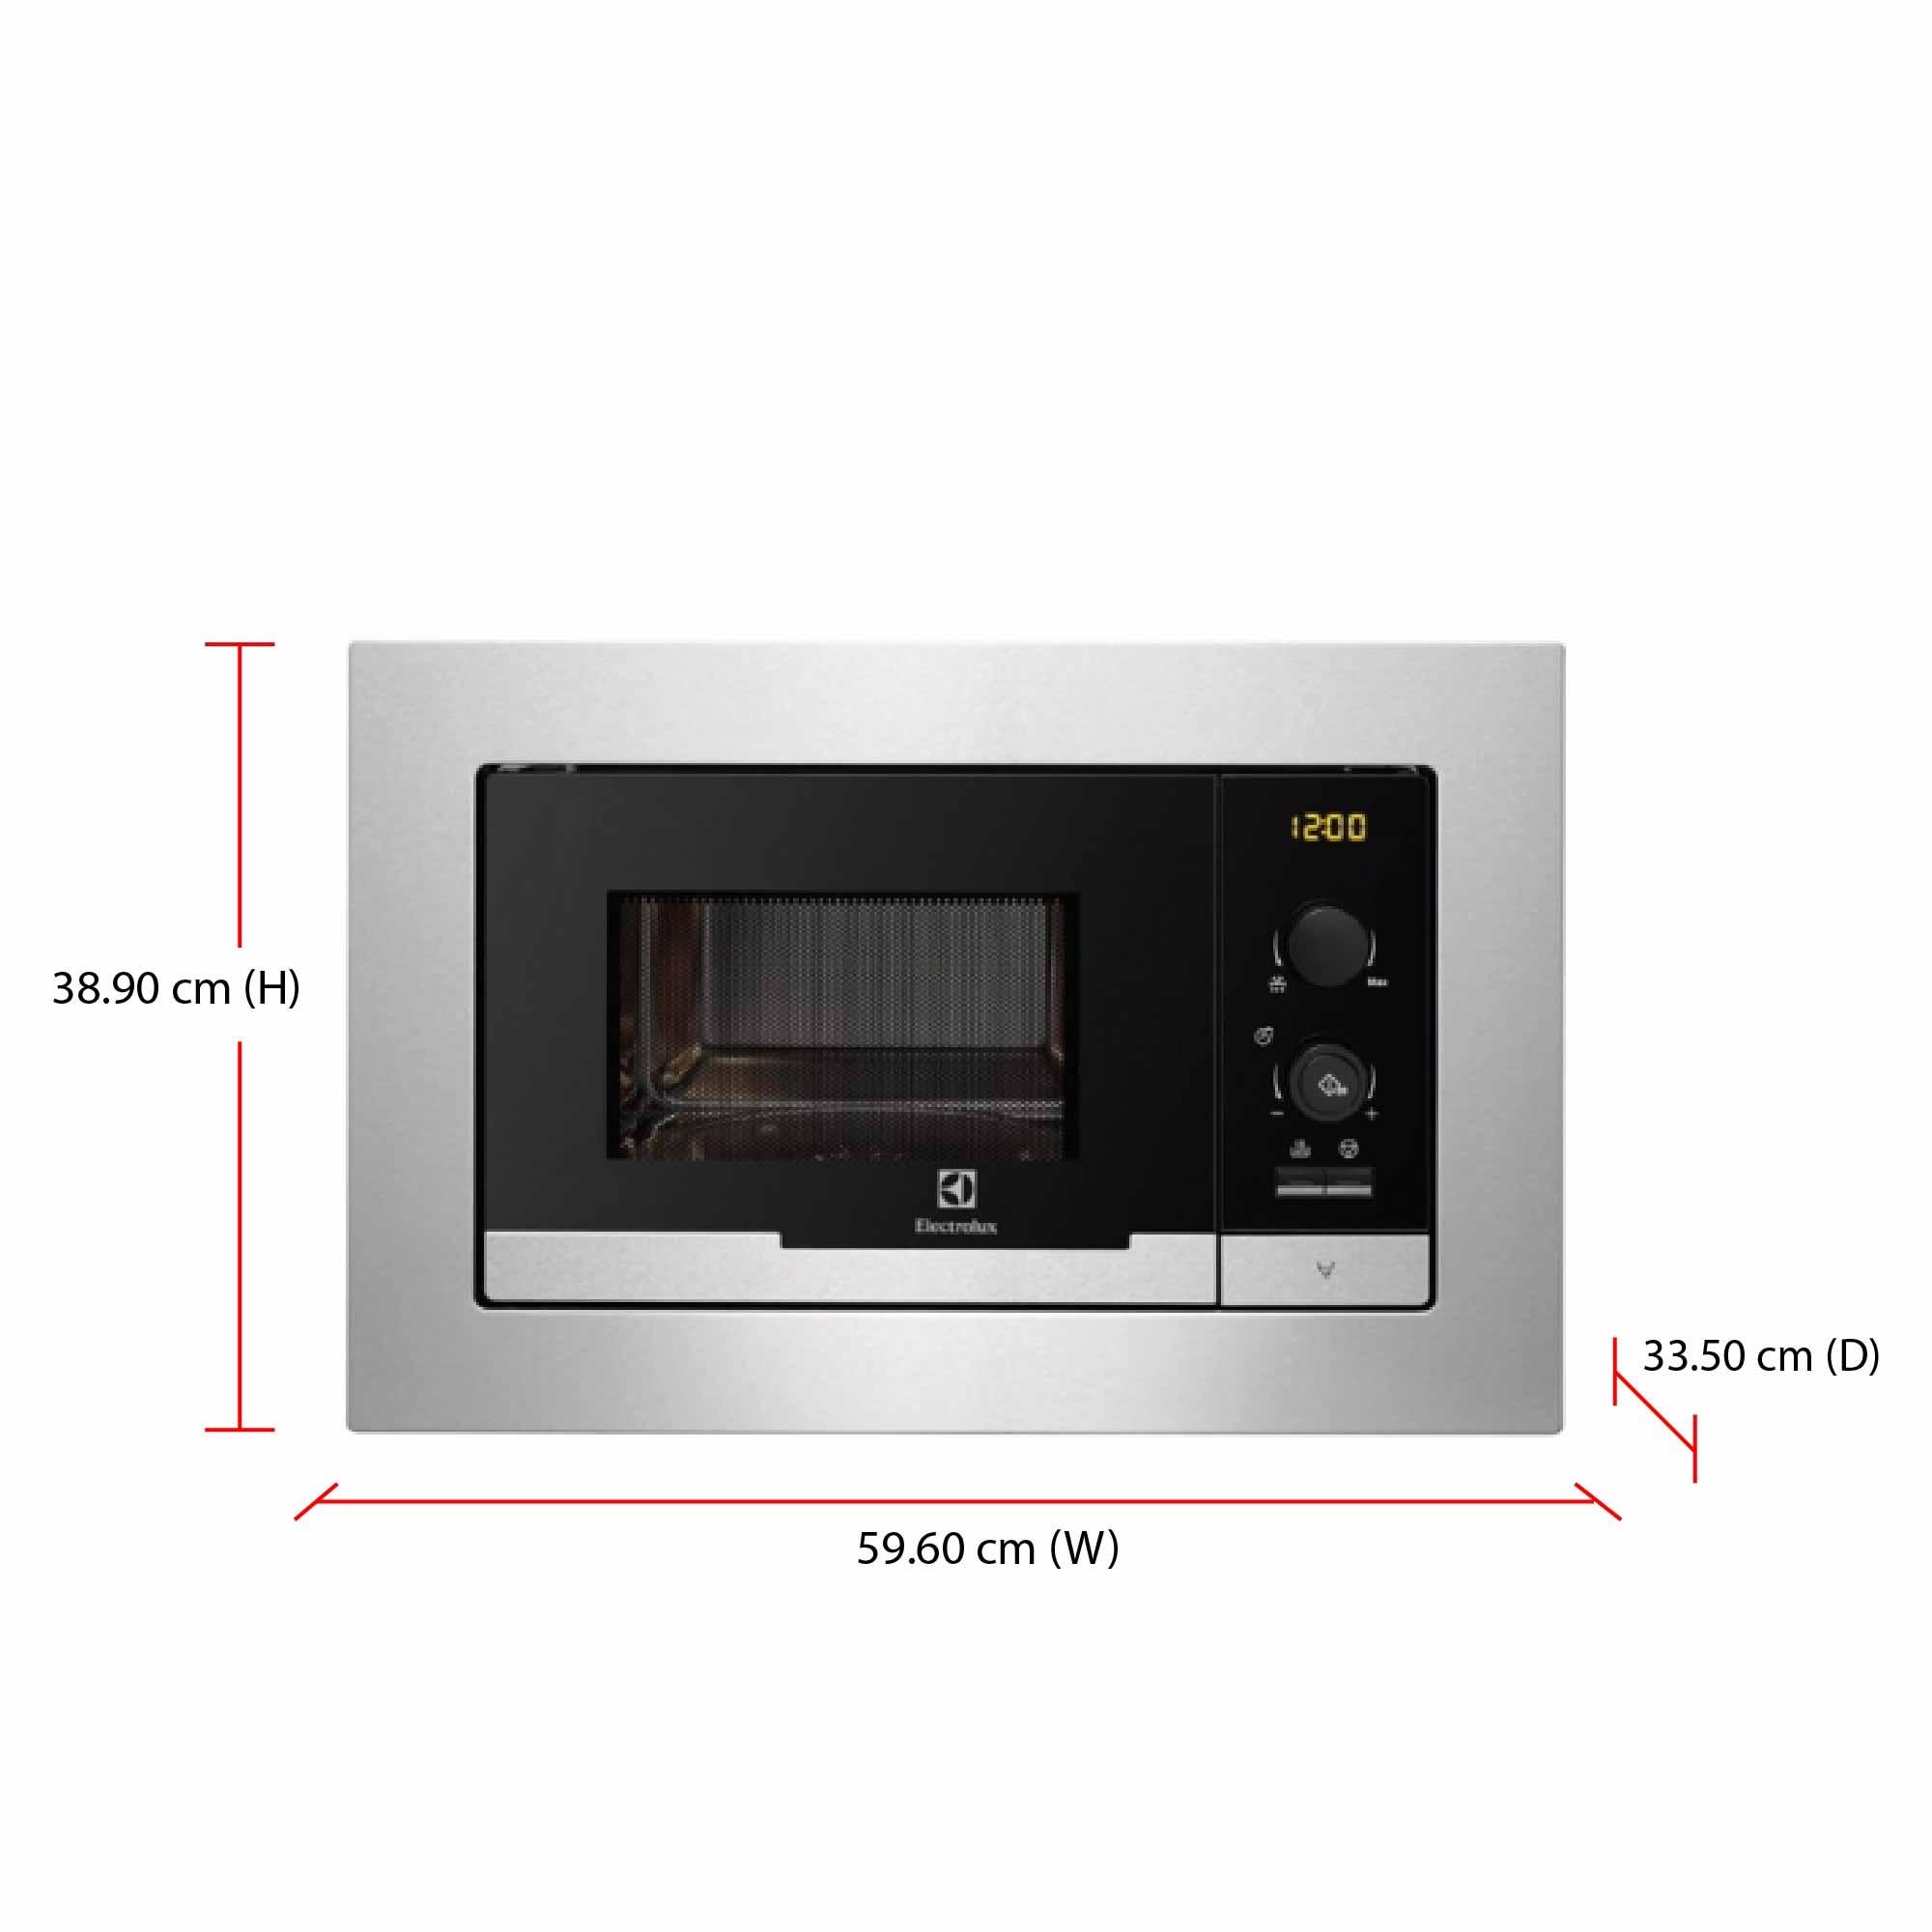 Product Description Electrolux 60 Cm Semi Built In Microwave Oven